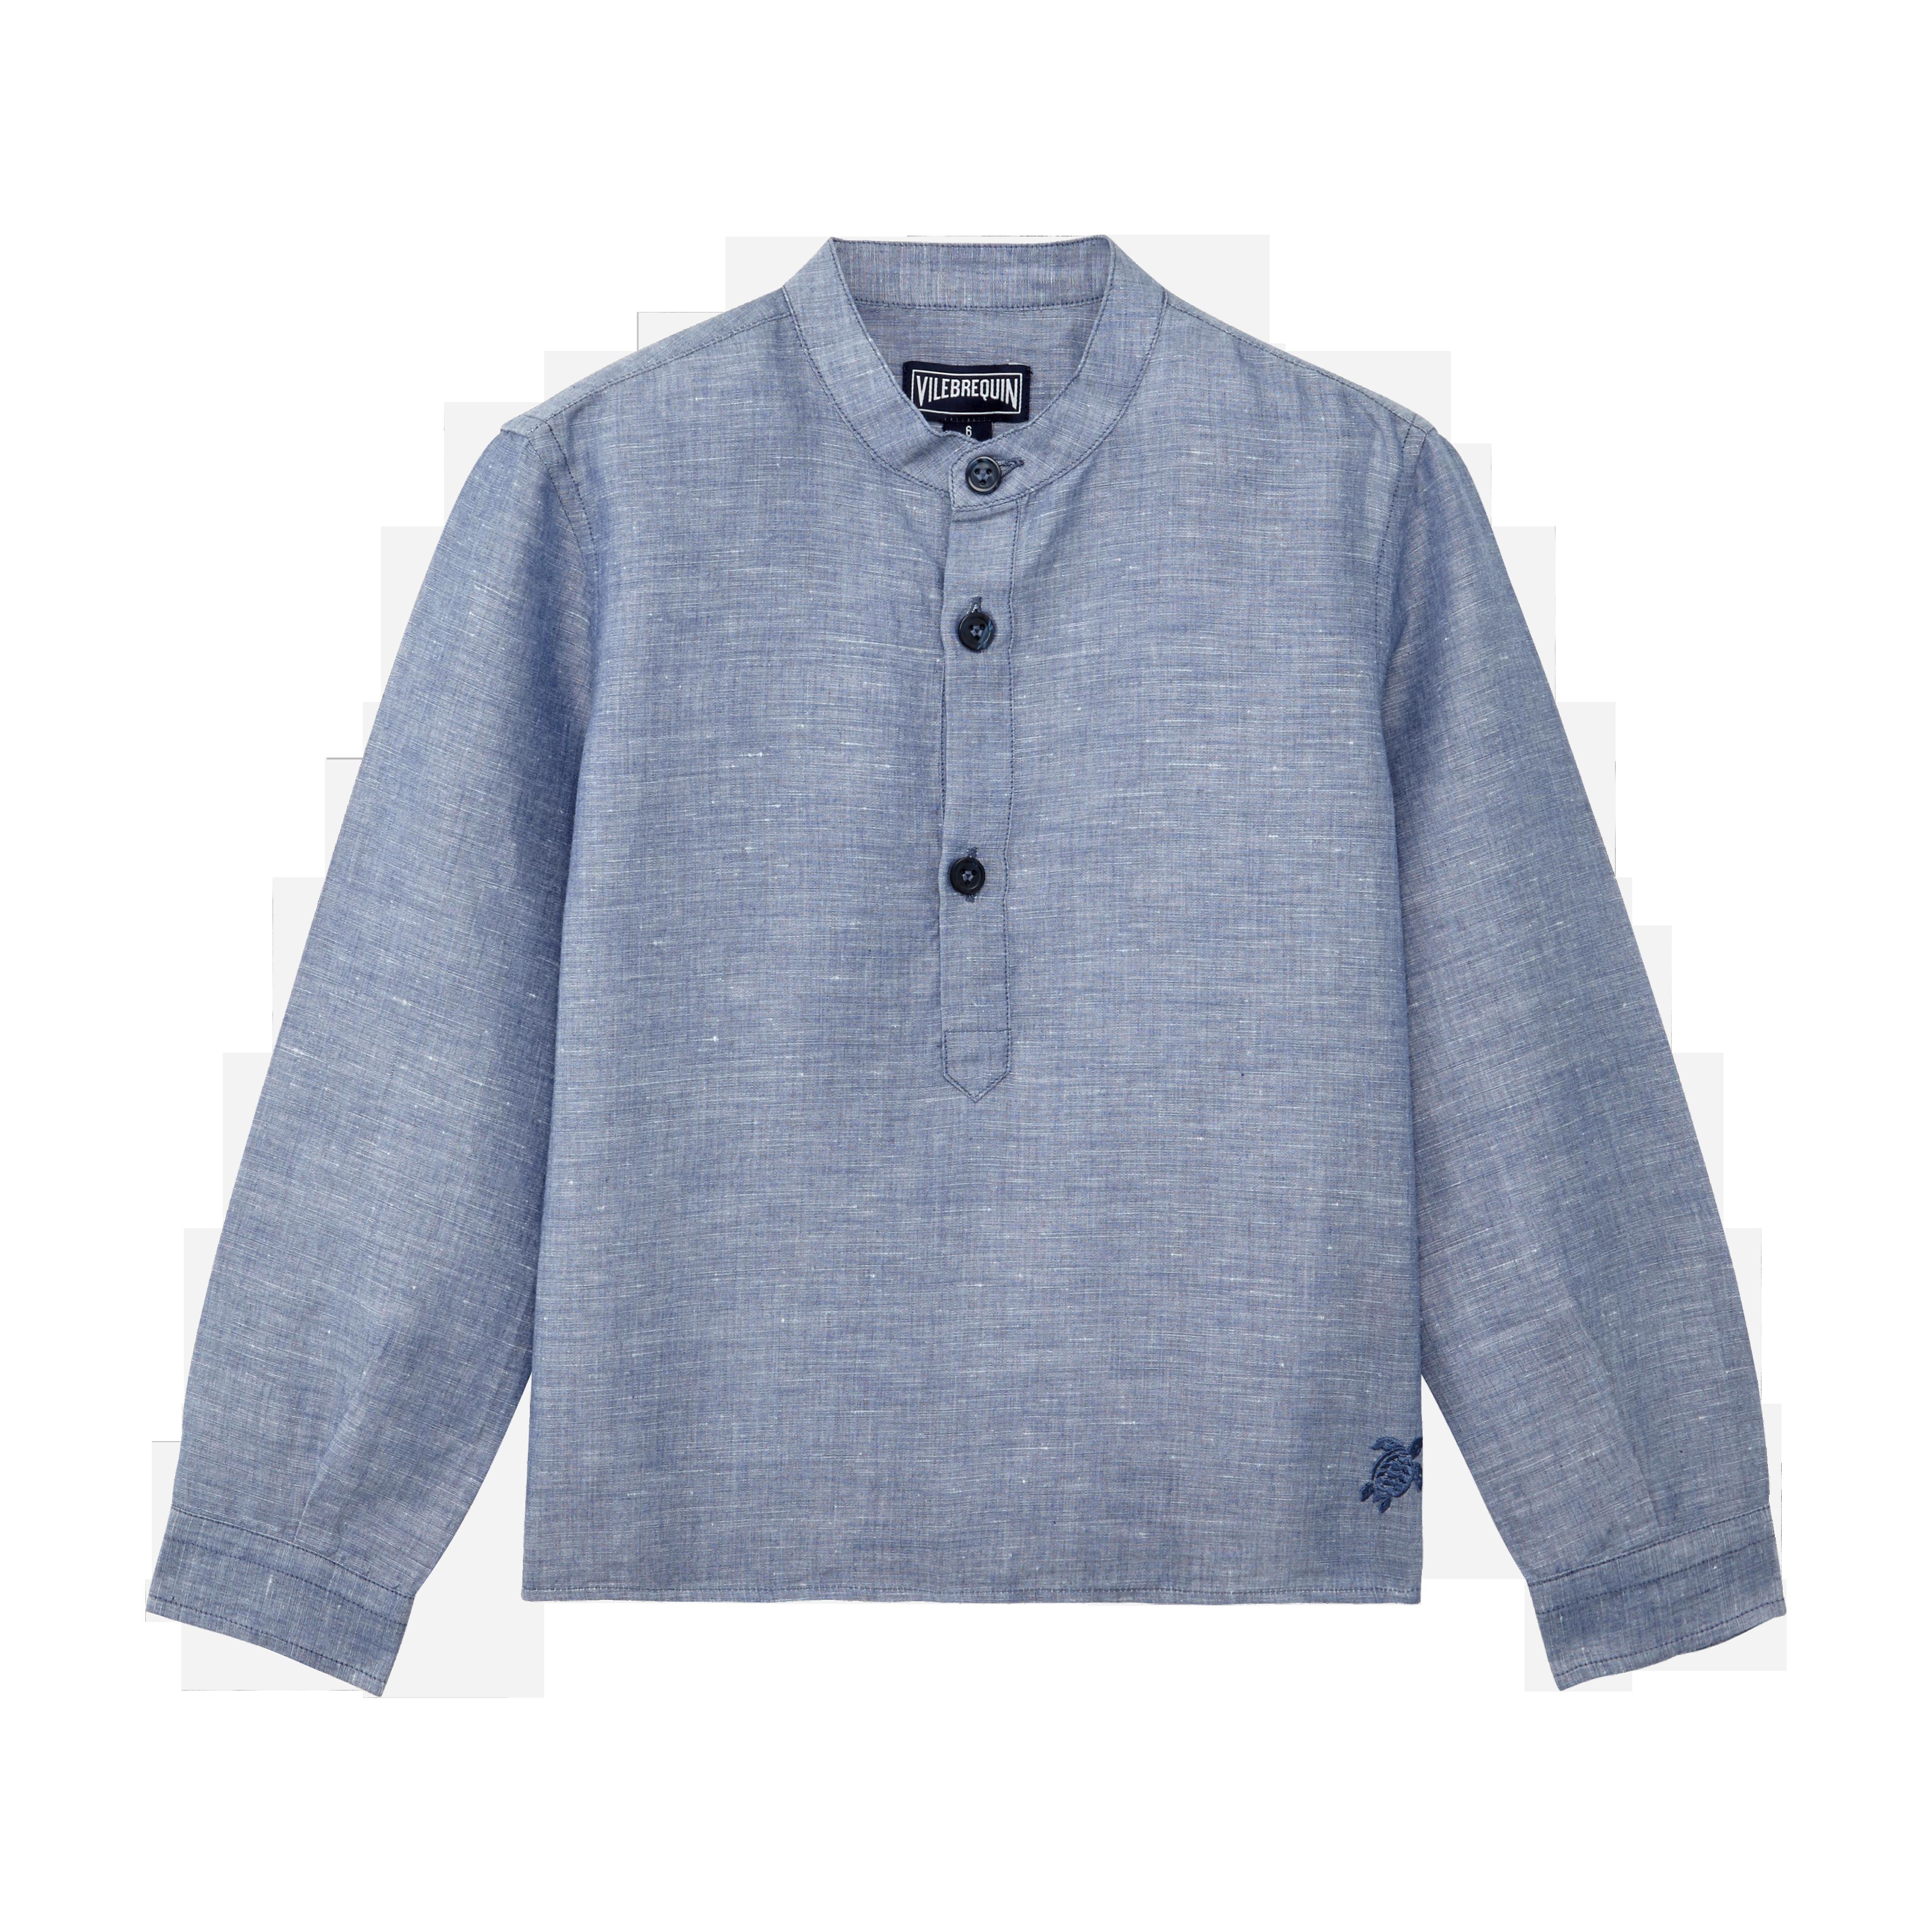 VILEBREQUIN | Boys Ready to Wear - Boys Linen Cotton Shirt Solid - SHIRT - JOMAO - Blue - 14 - Vilebrequin | Goxip